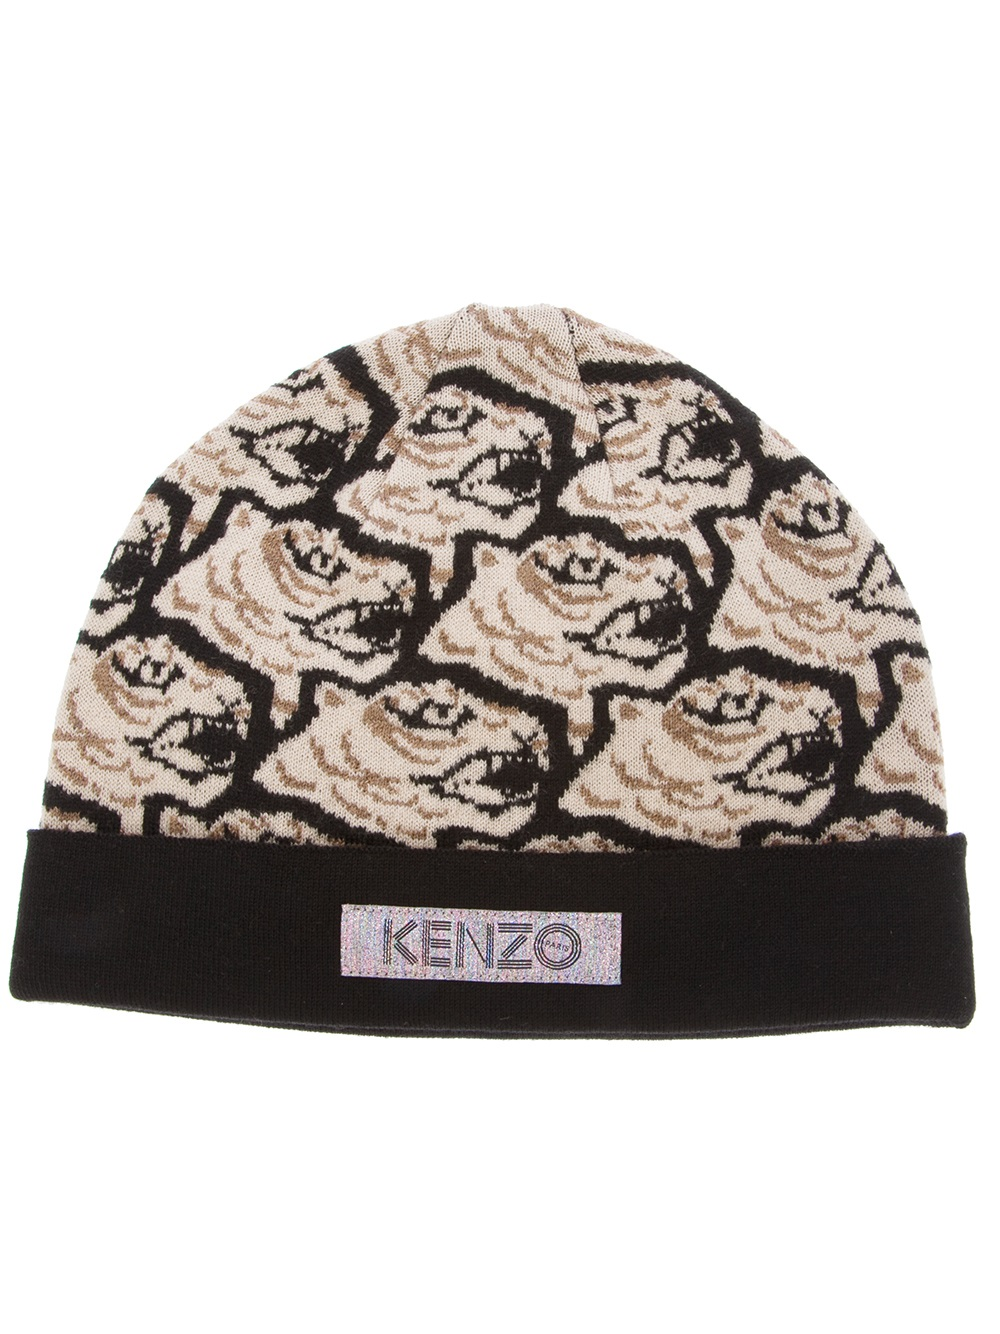 d3eca379c13 Lyst - KENZO Tiger Print Beanie Hat in Natural for Men